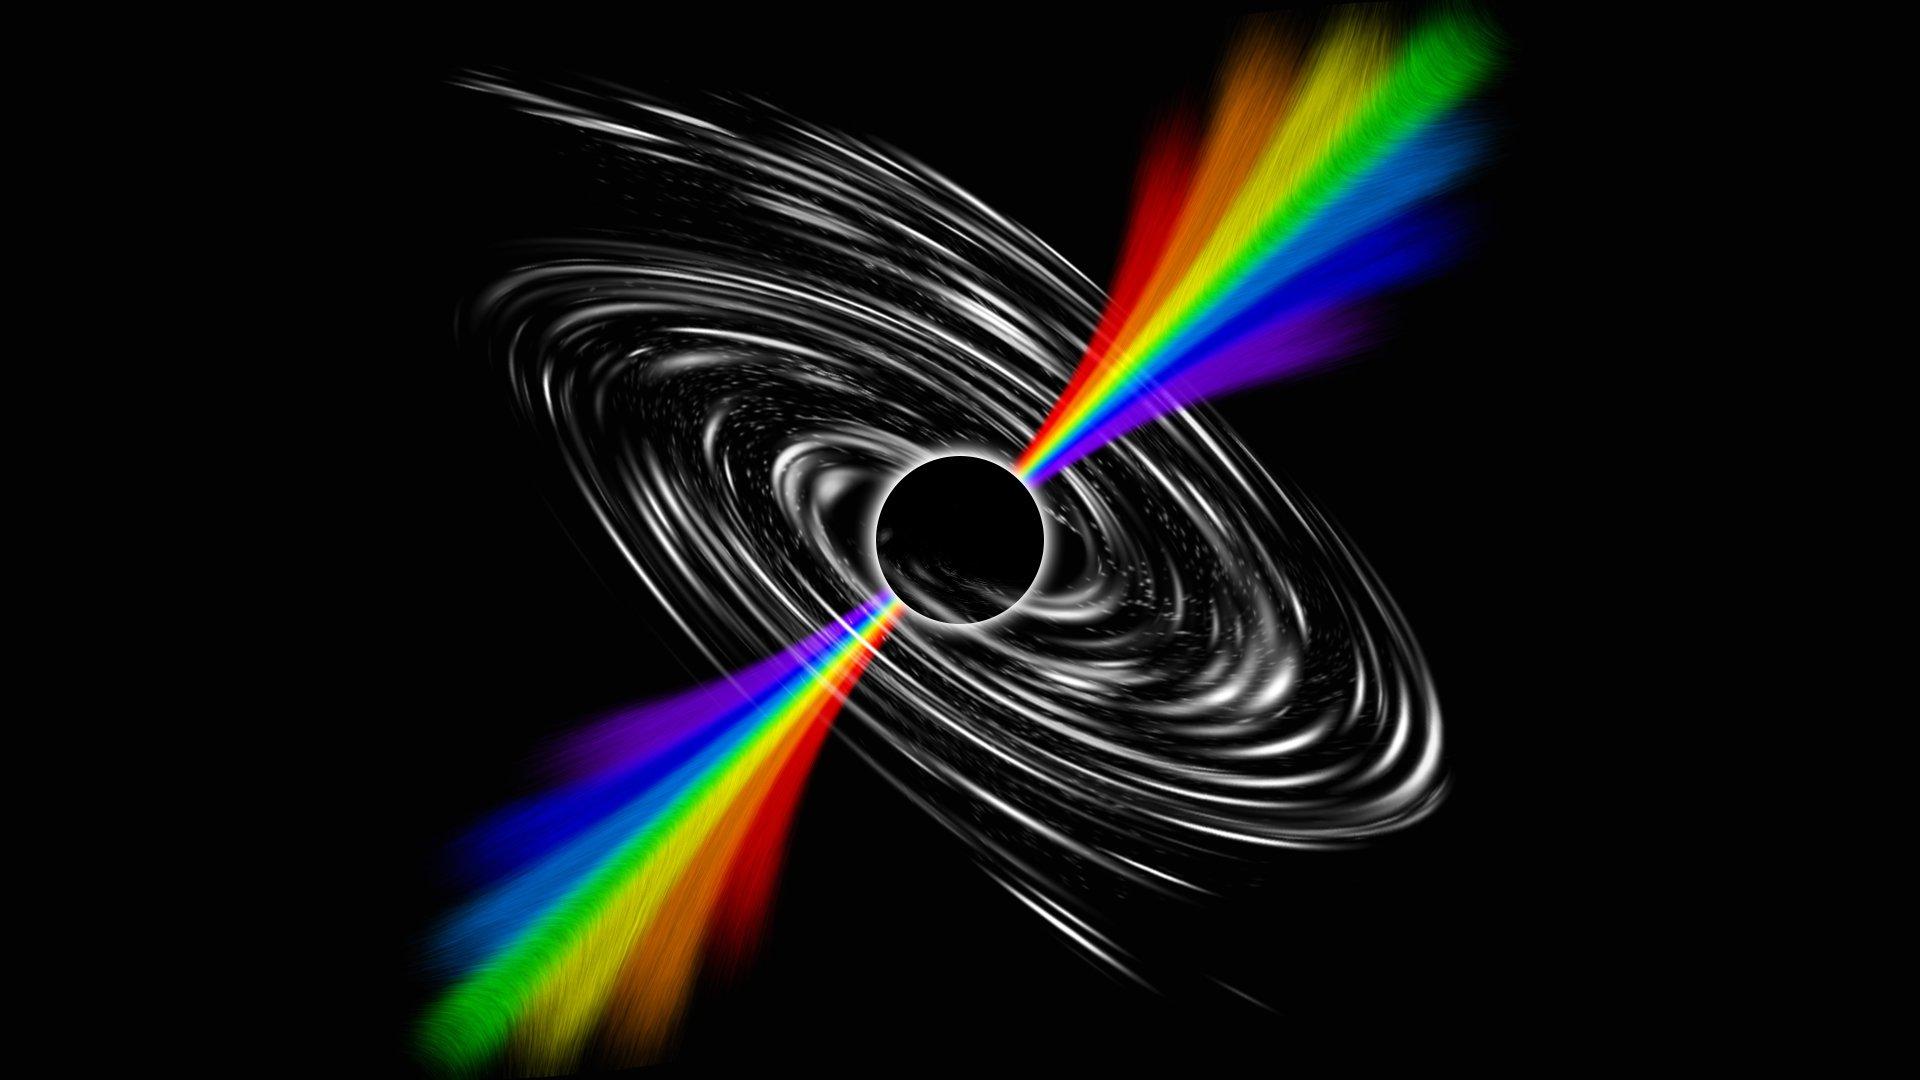 Black Hole Hd Wallpaper Background Image 1920x1080 Id